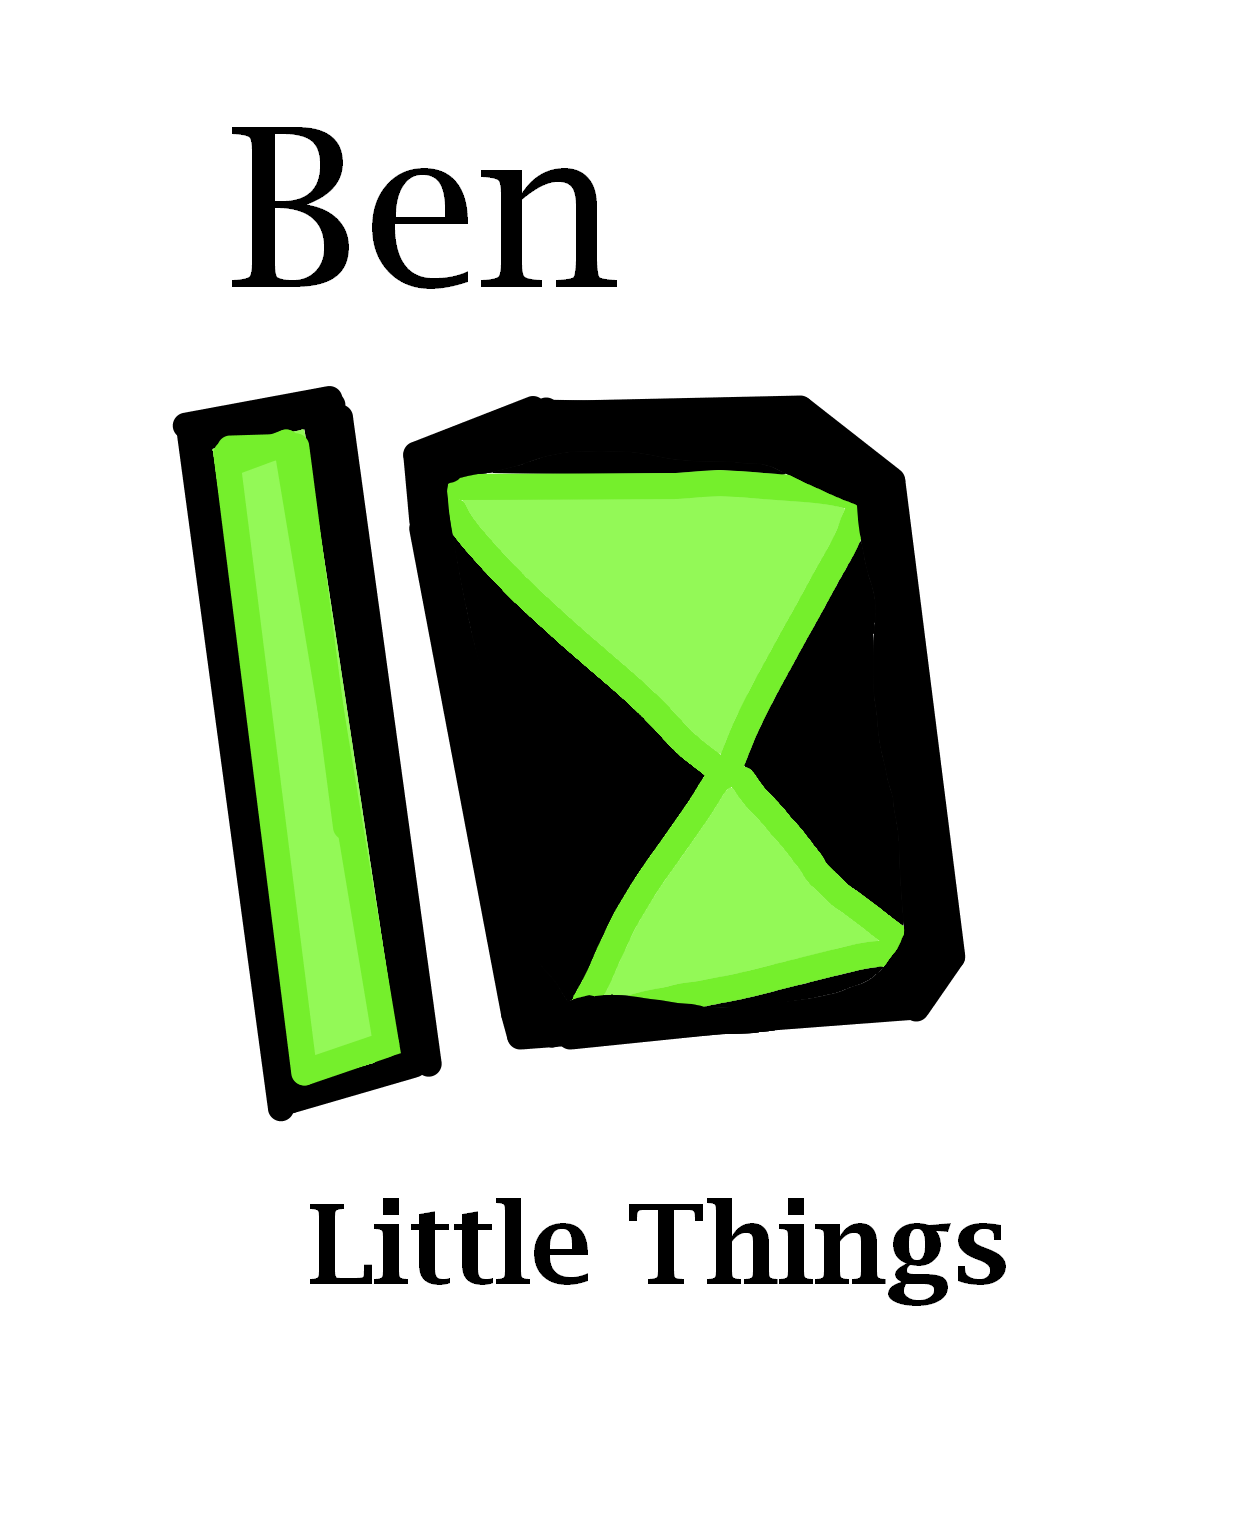 Ben 10: Little Things